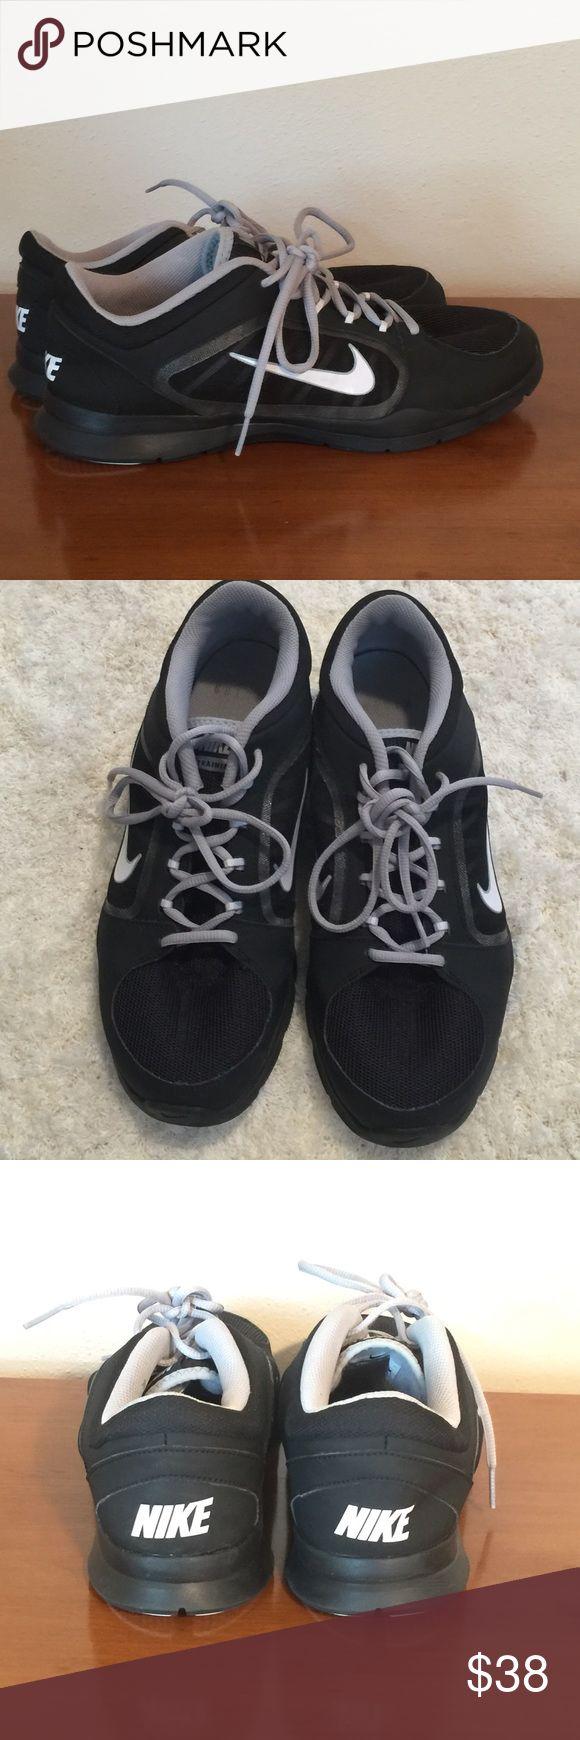 Like new Nike trainers EUC black/ gray/ white 04/08/14 Nike Shoes Athletic Shoes